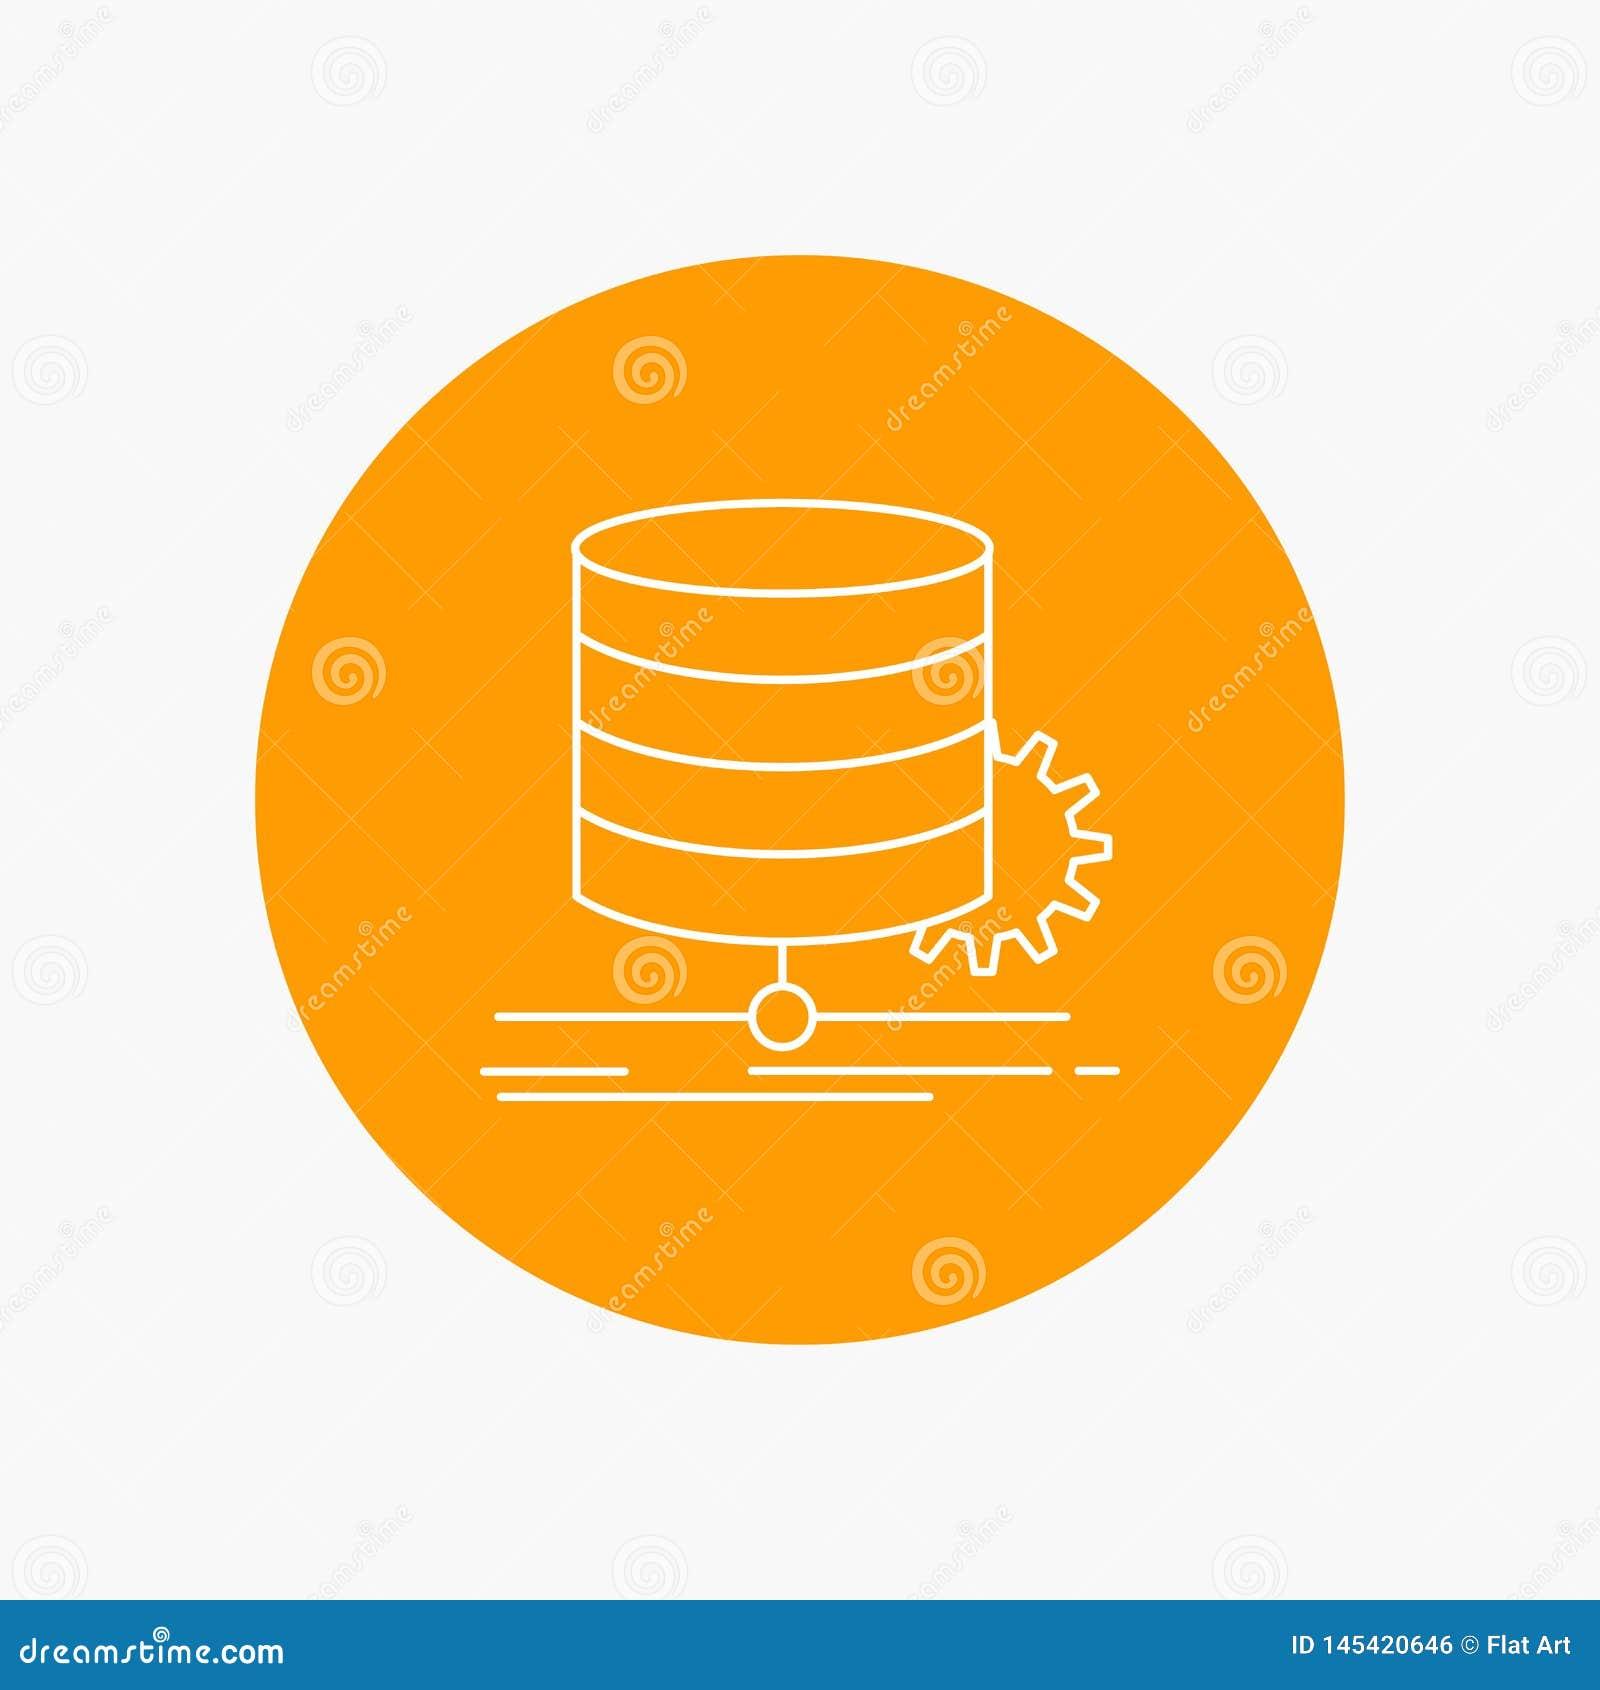 Algorithm, chart, data, diagram, flow White Line Icon in Circle background. vector icon illustration